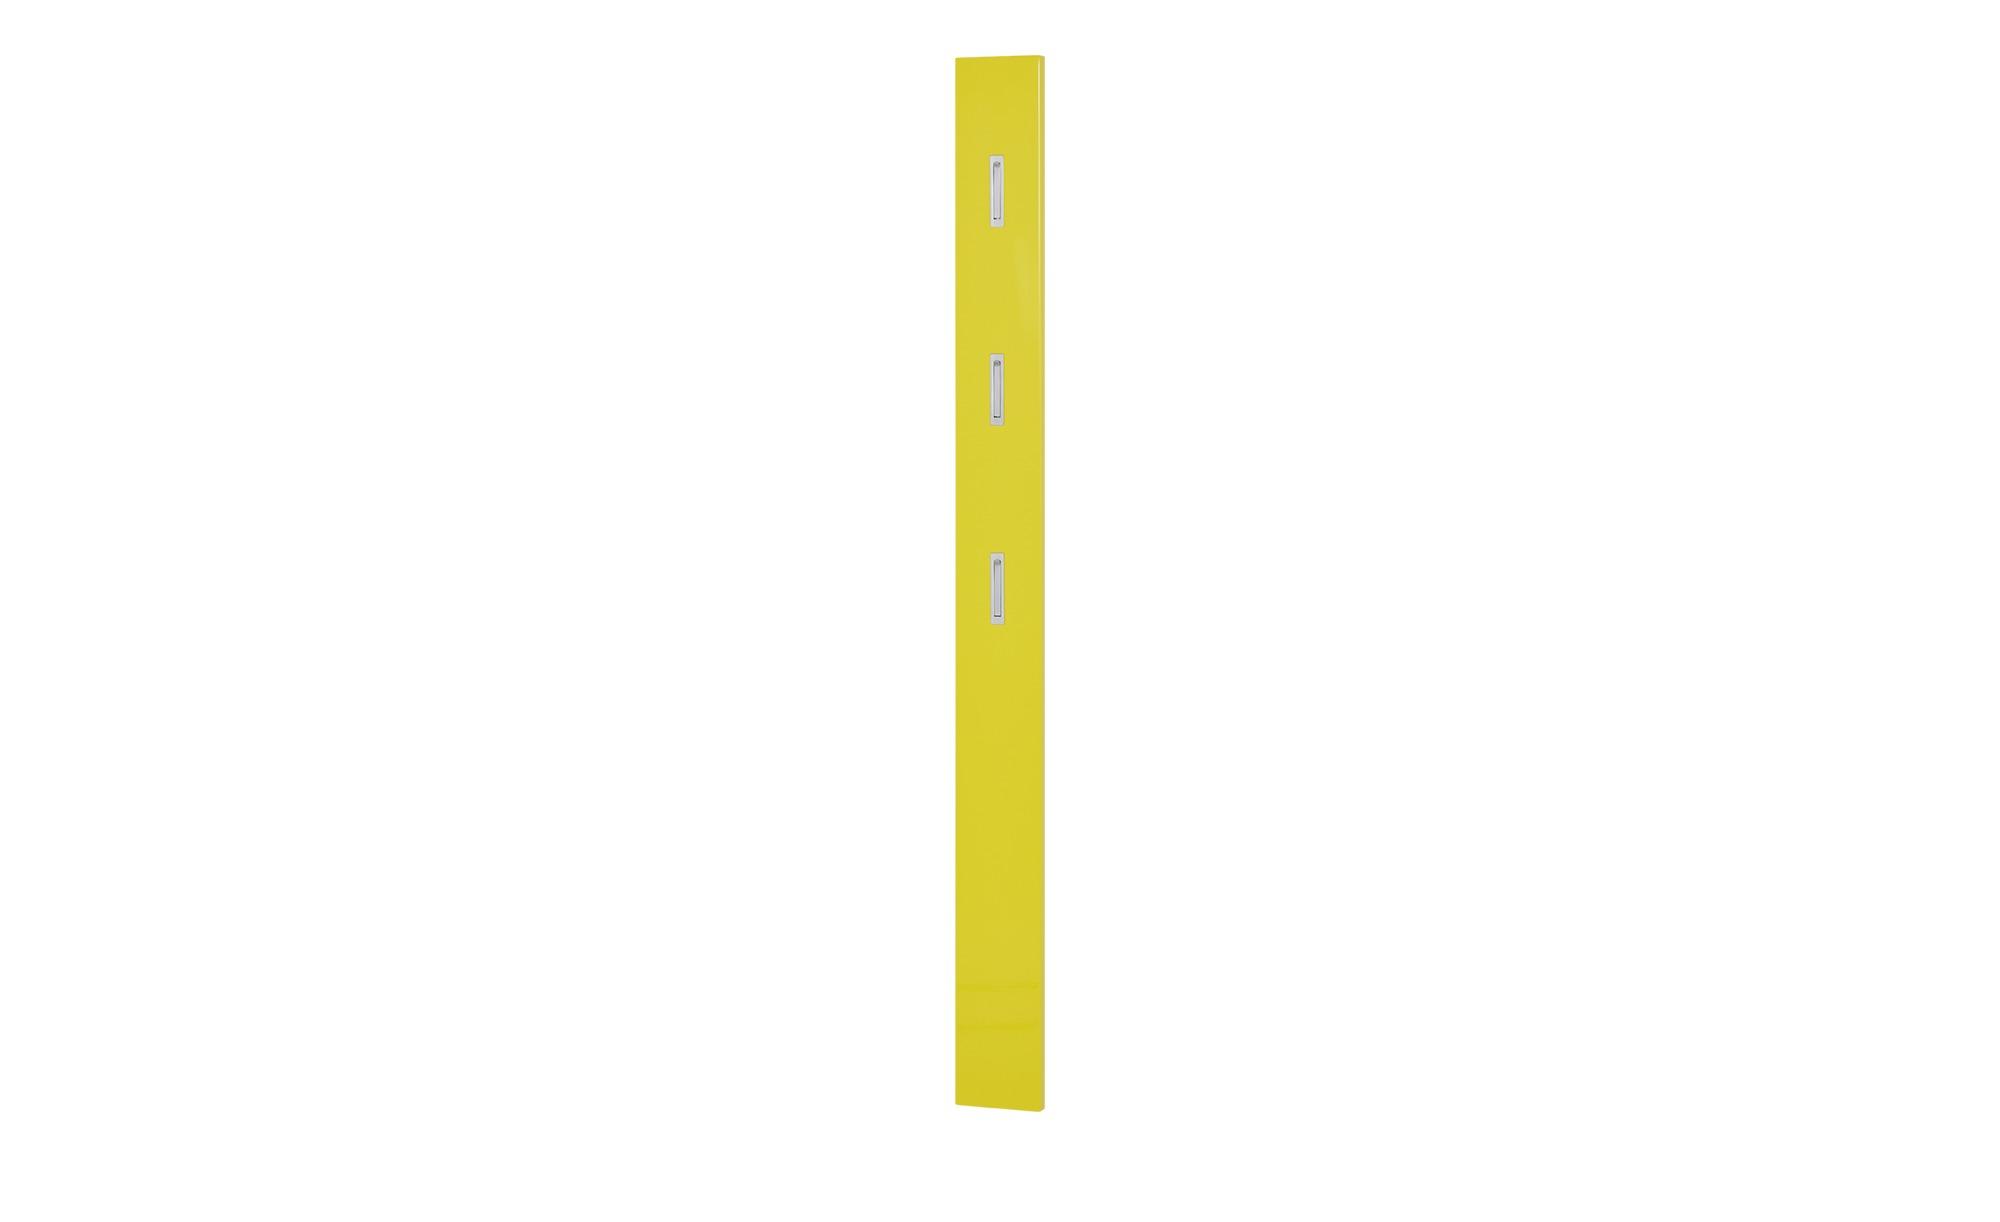 uno garderobenpaneel rainbow gelb masse cm b 15 h 170 t 2 garderoben kleiderstangen garderoben hoffner